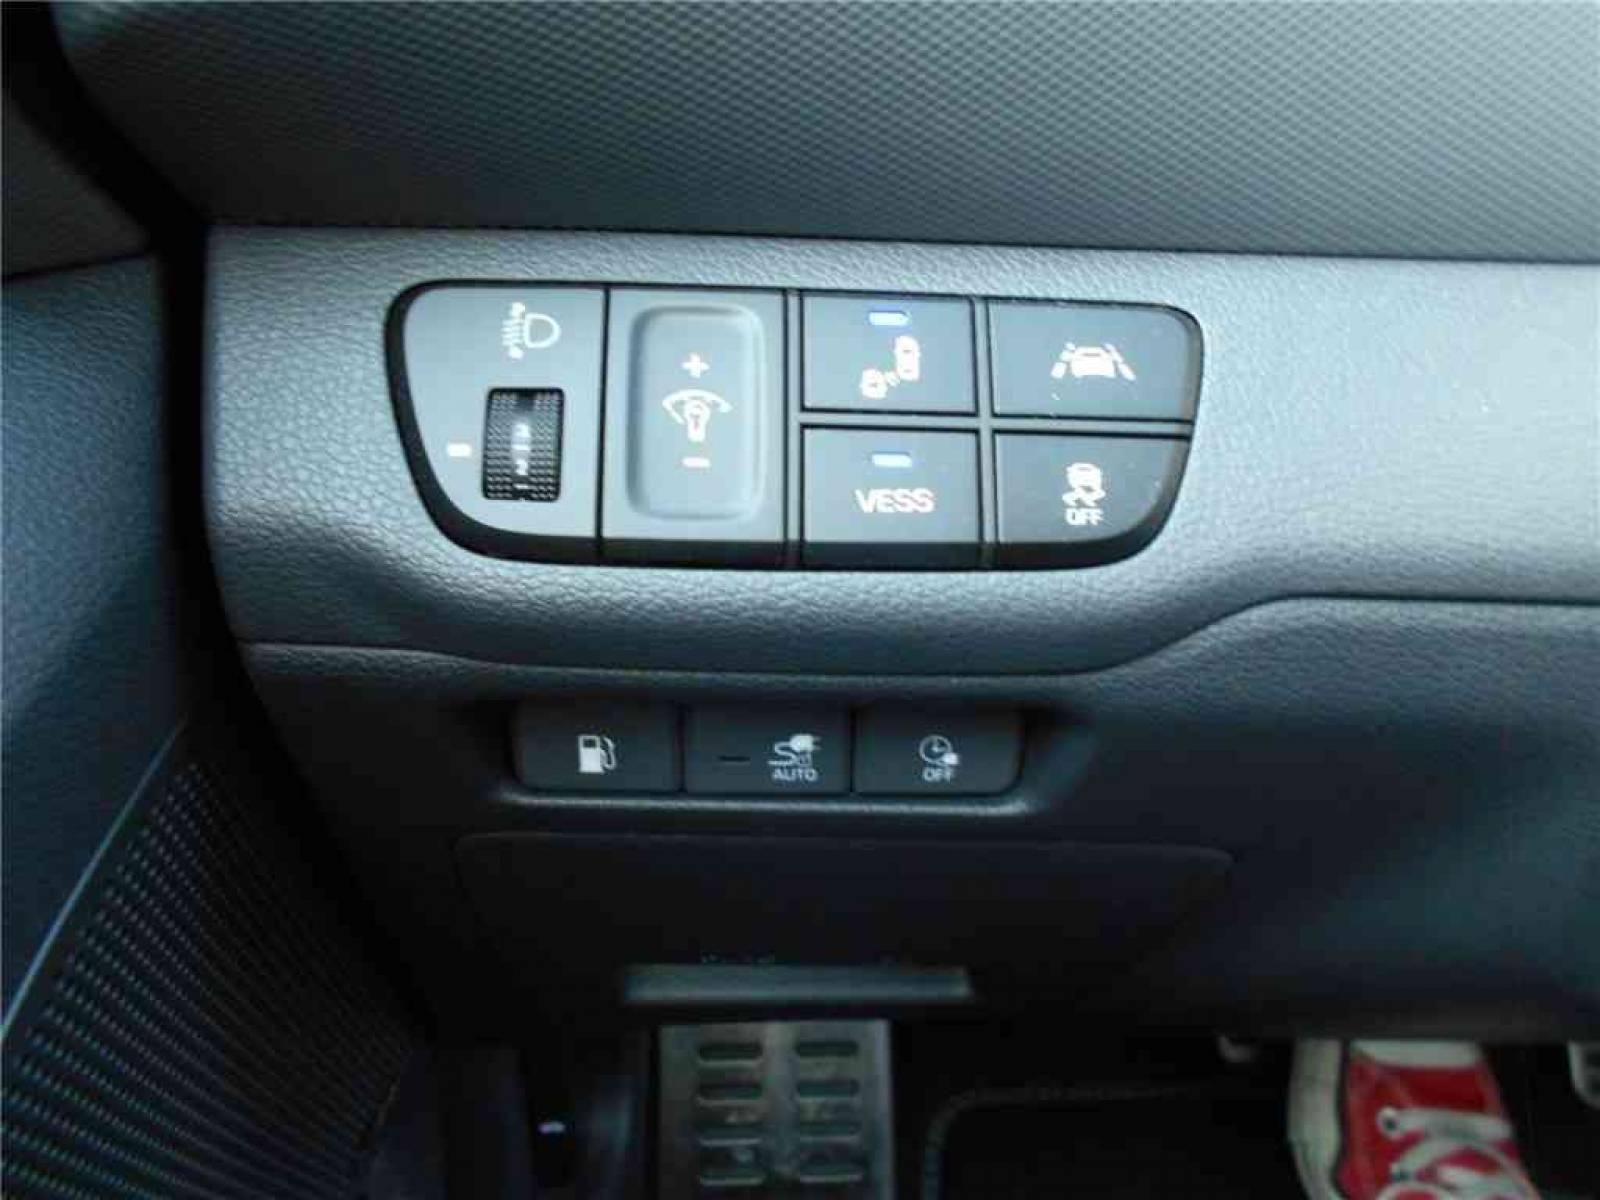 HYUNDAI Ioniq Plug-in 141 ch - véhicule d'occasion - Groupe Guillet - Chalon Automobiles - 71100 - Chalon-sur-Saône - 12